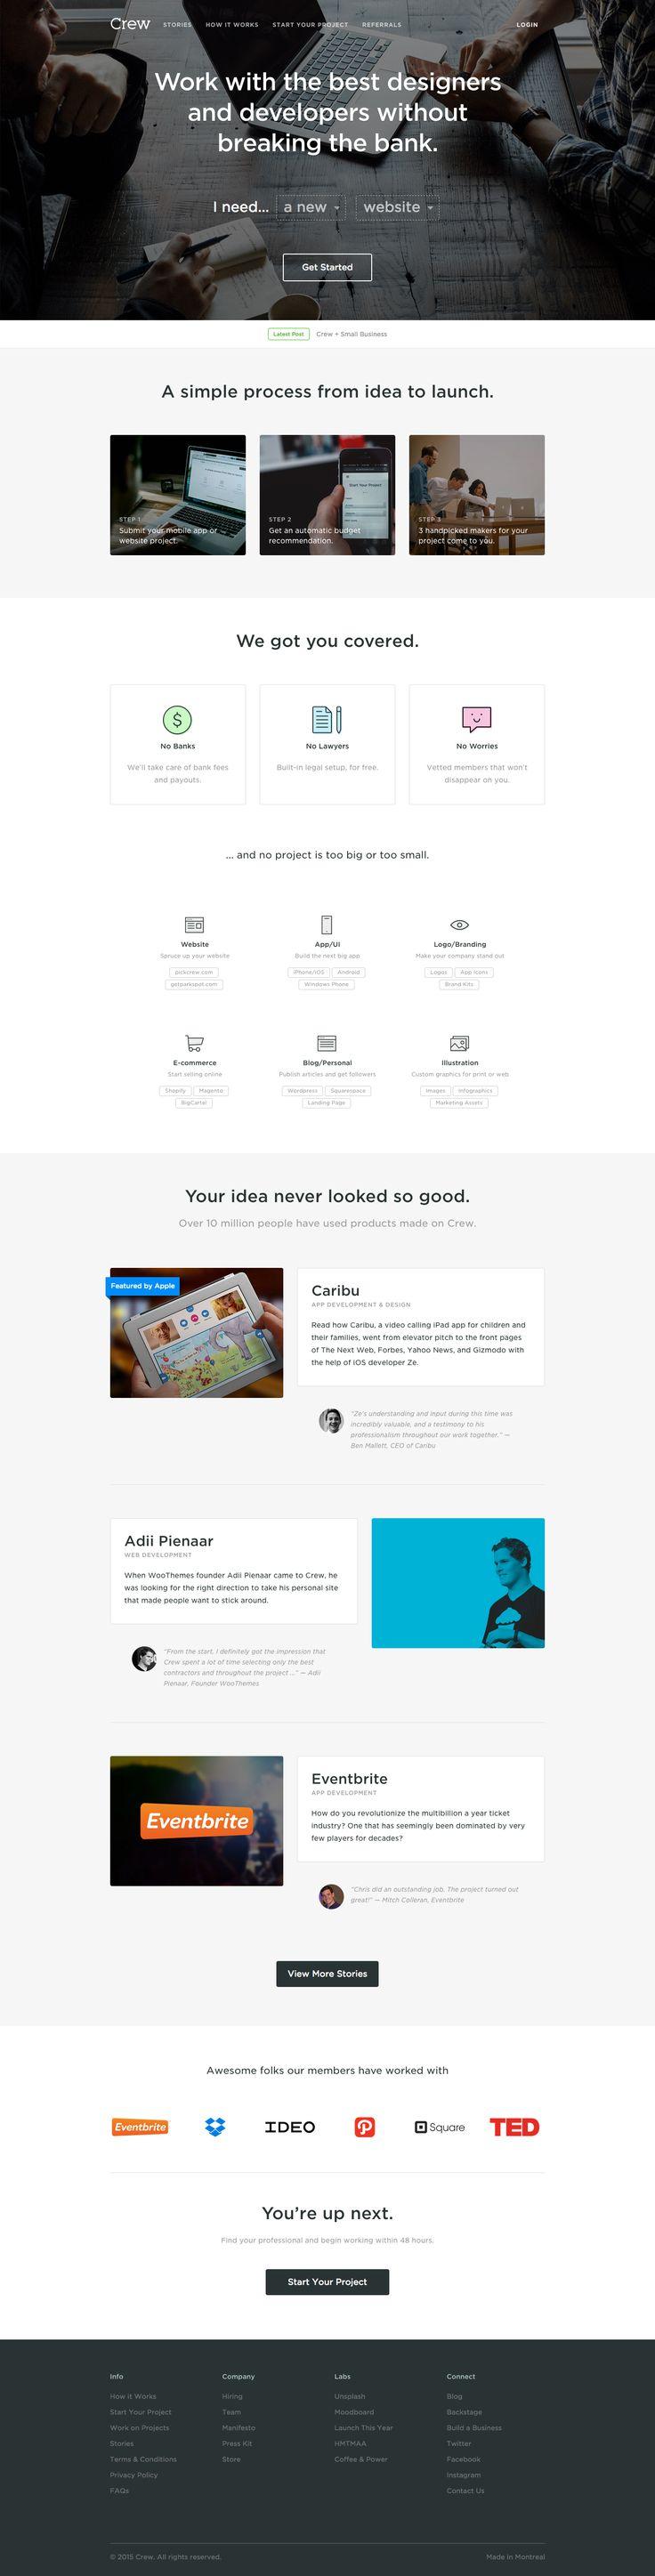 https://pickcrew.com/ Handpicked Freelance Web design & web developers.